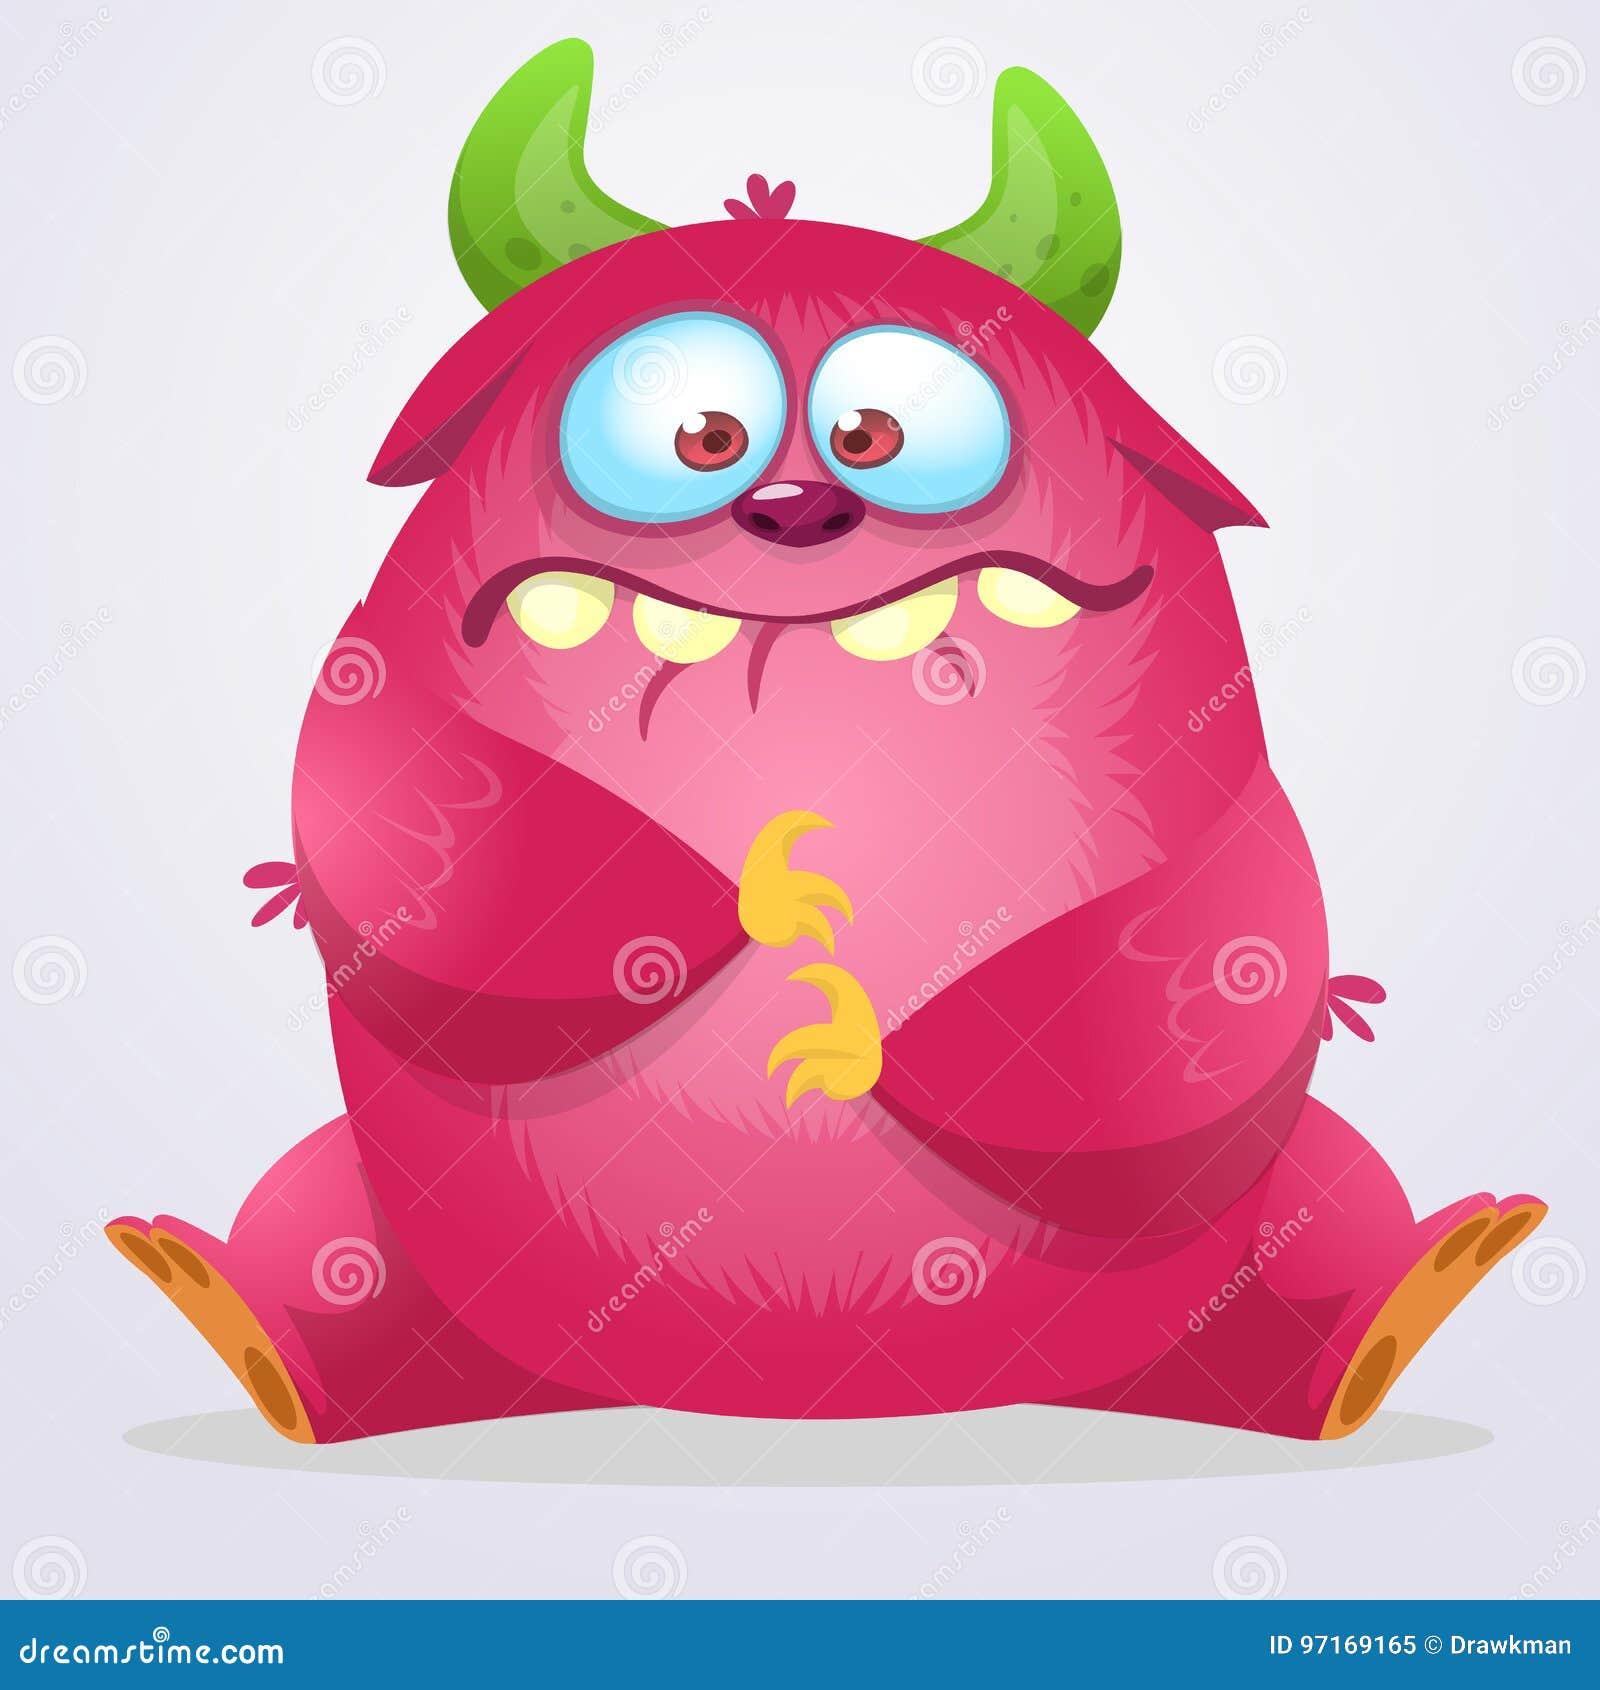 Happy cartoon monster. Halloween pink furry monster. Big collection of cute monsters. Halloween character. Vector illustrations